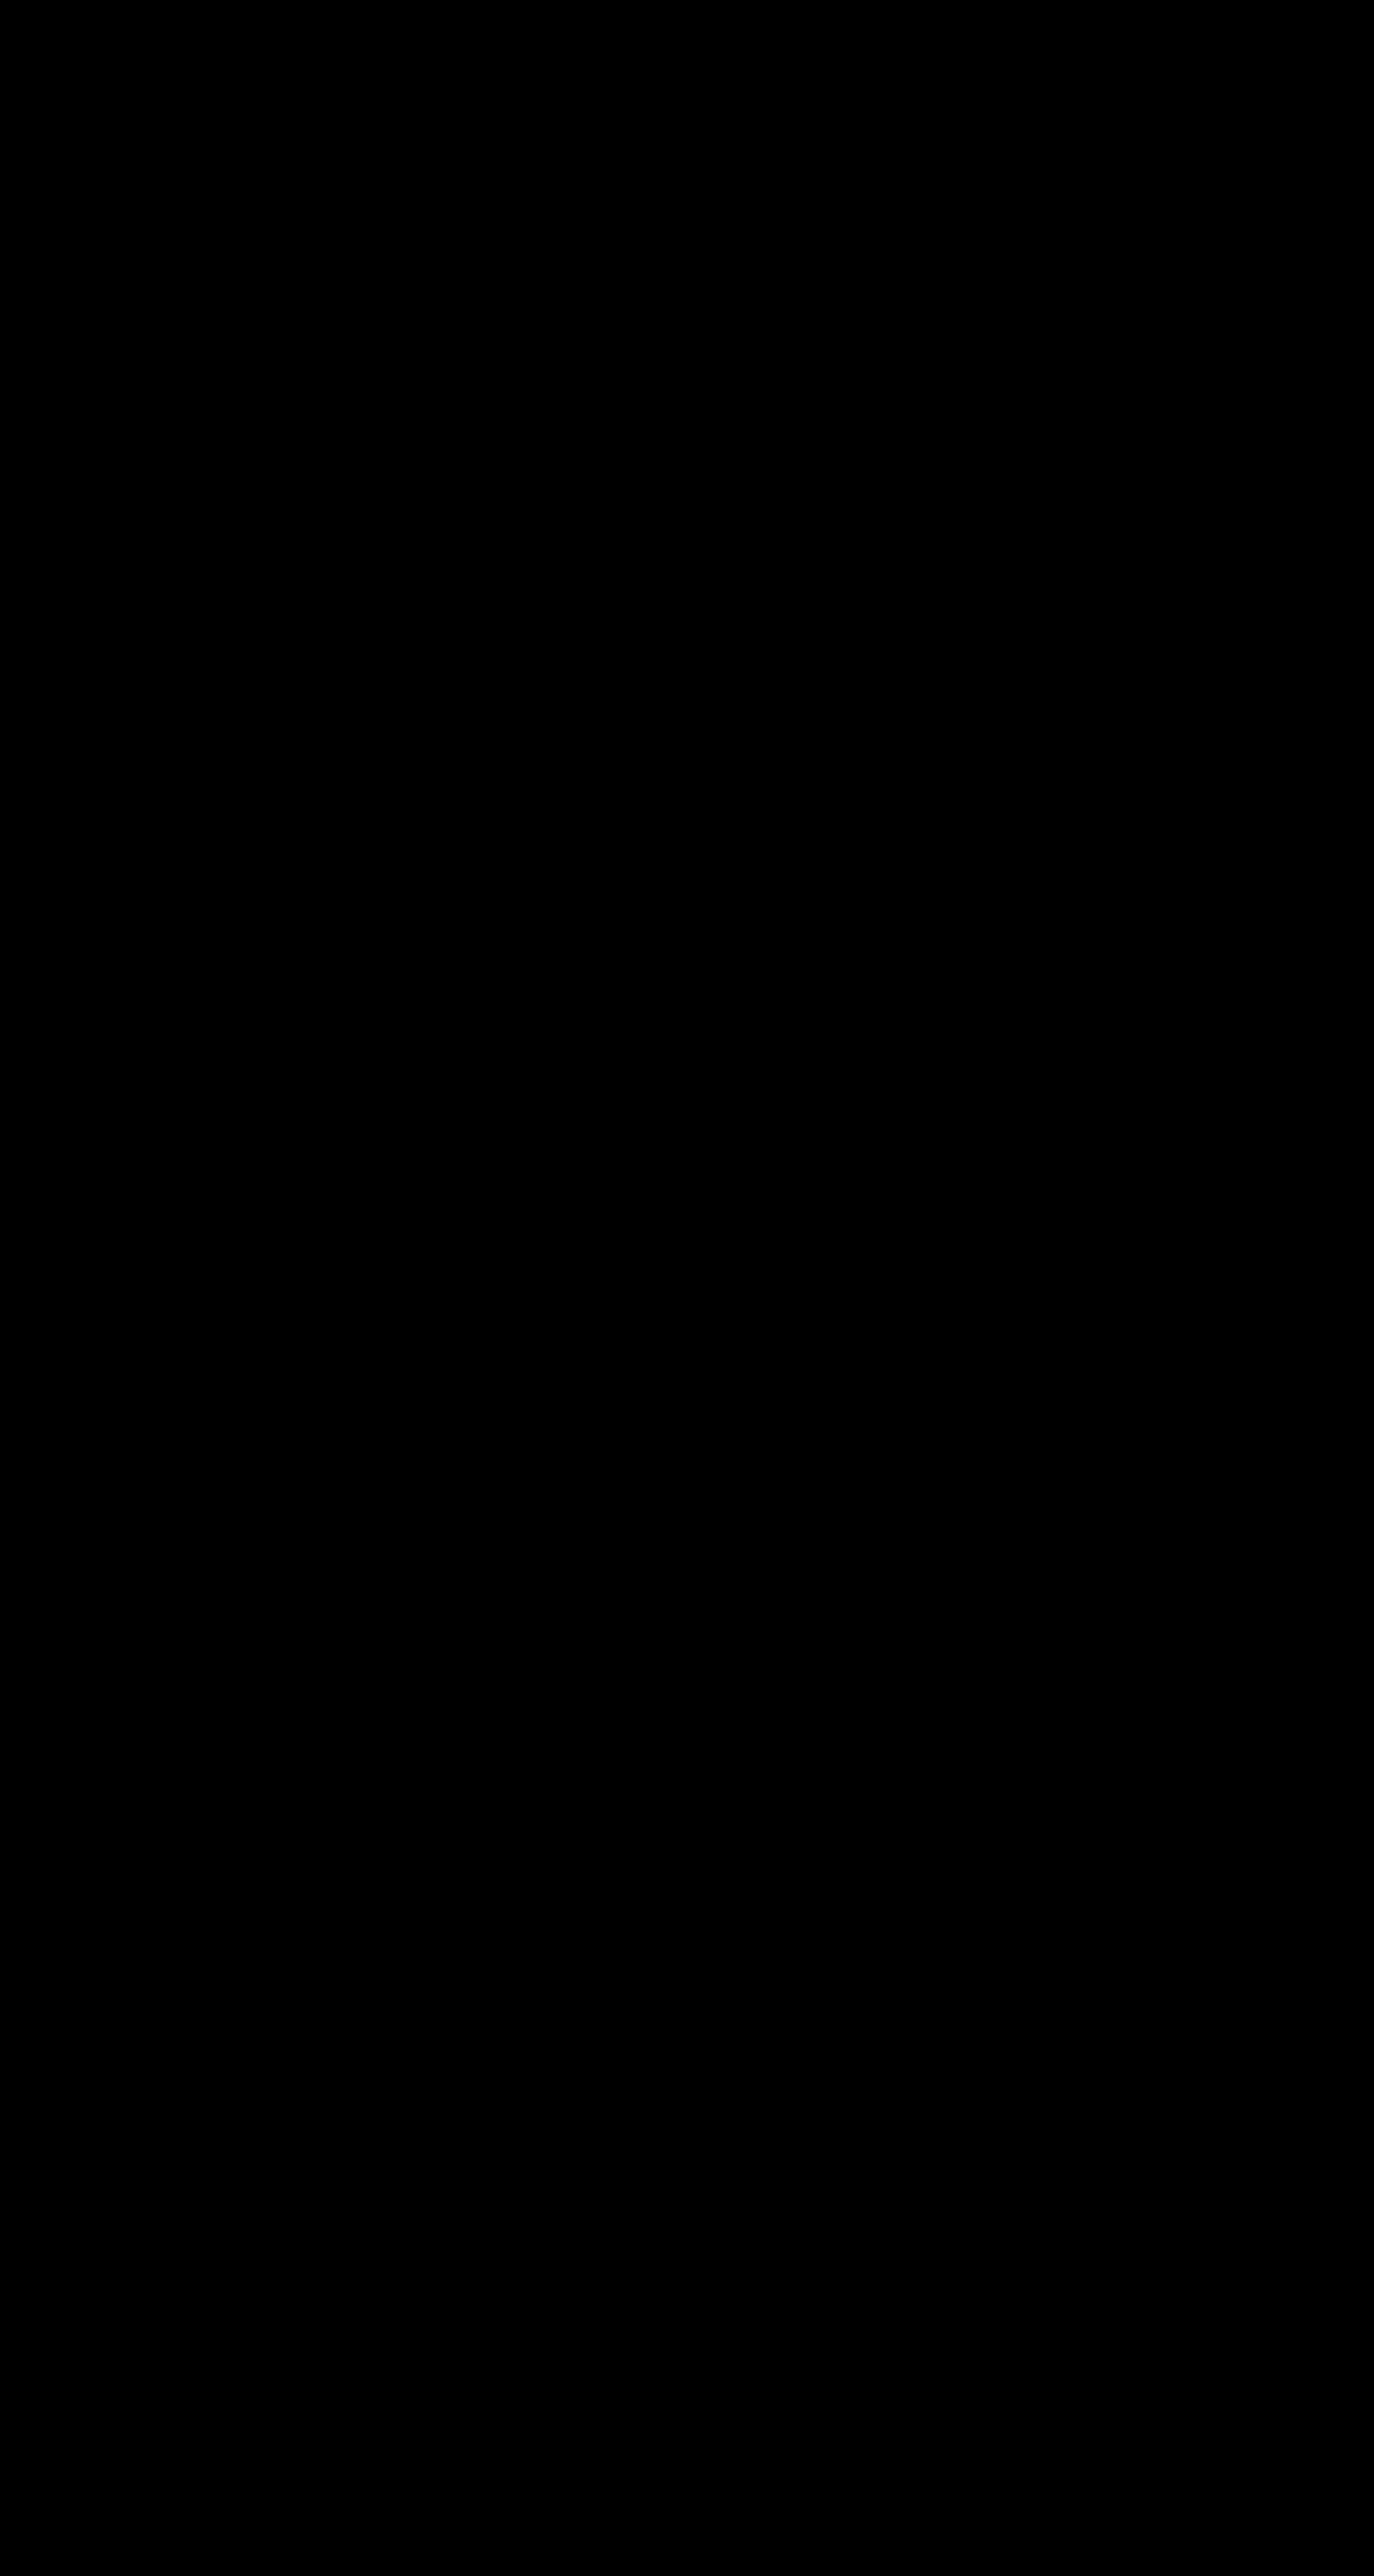 Juventus Logo Png Transparent Svg Vector Freebie Supply